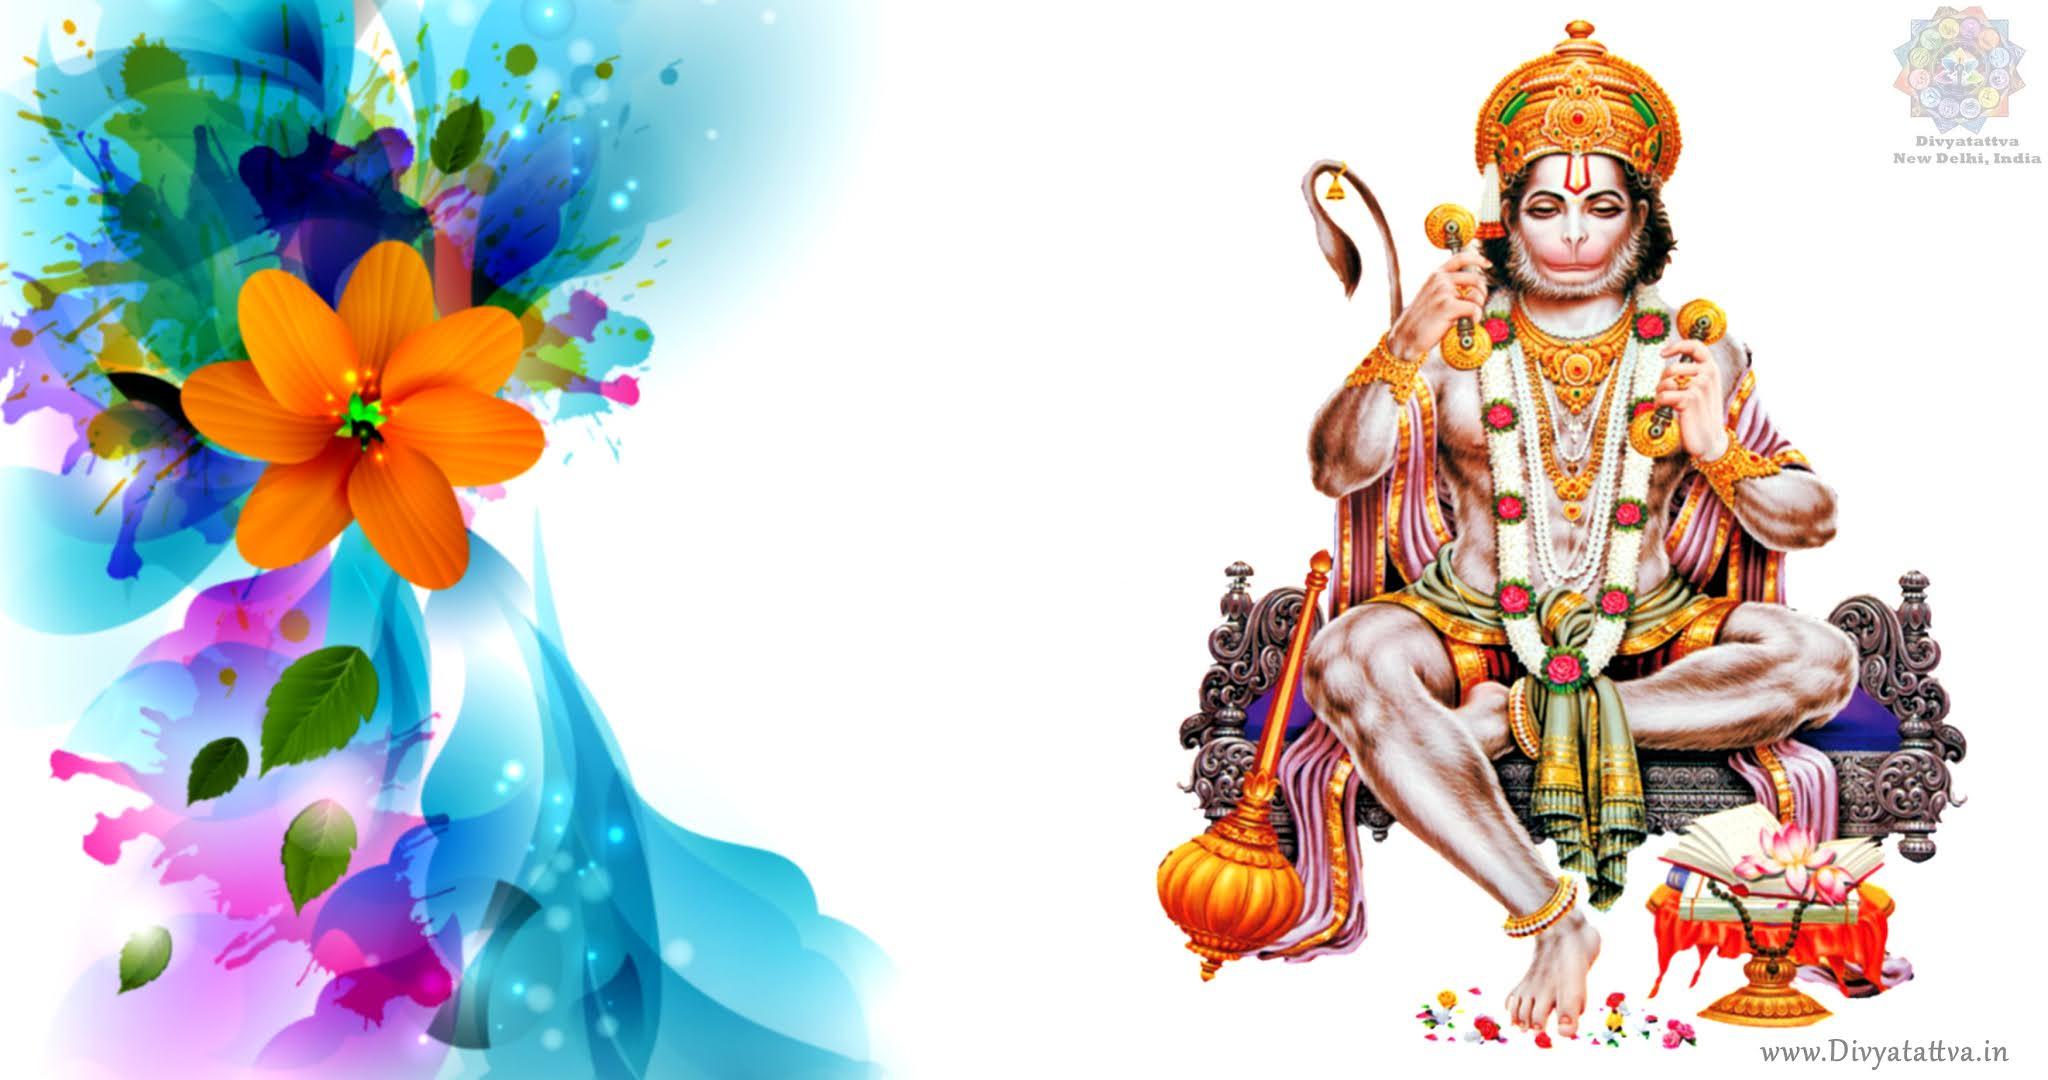 Hanuman Jayanti Wallpapers, Lord Hanuman Pictures in 4K HD, Hindu God Hanuman Ji Stock Photos & Images